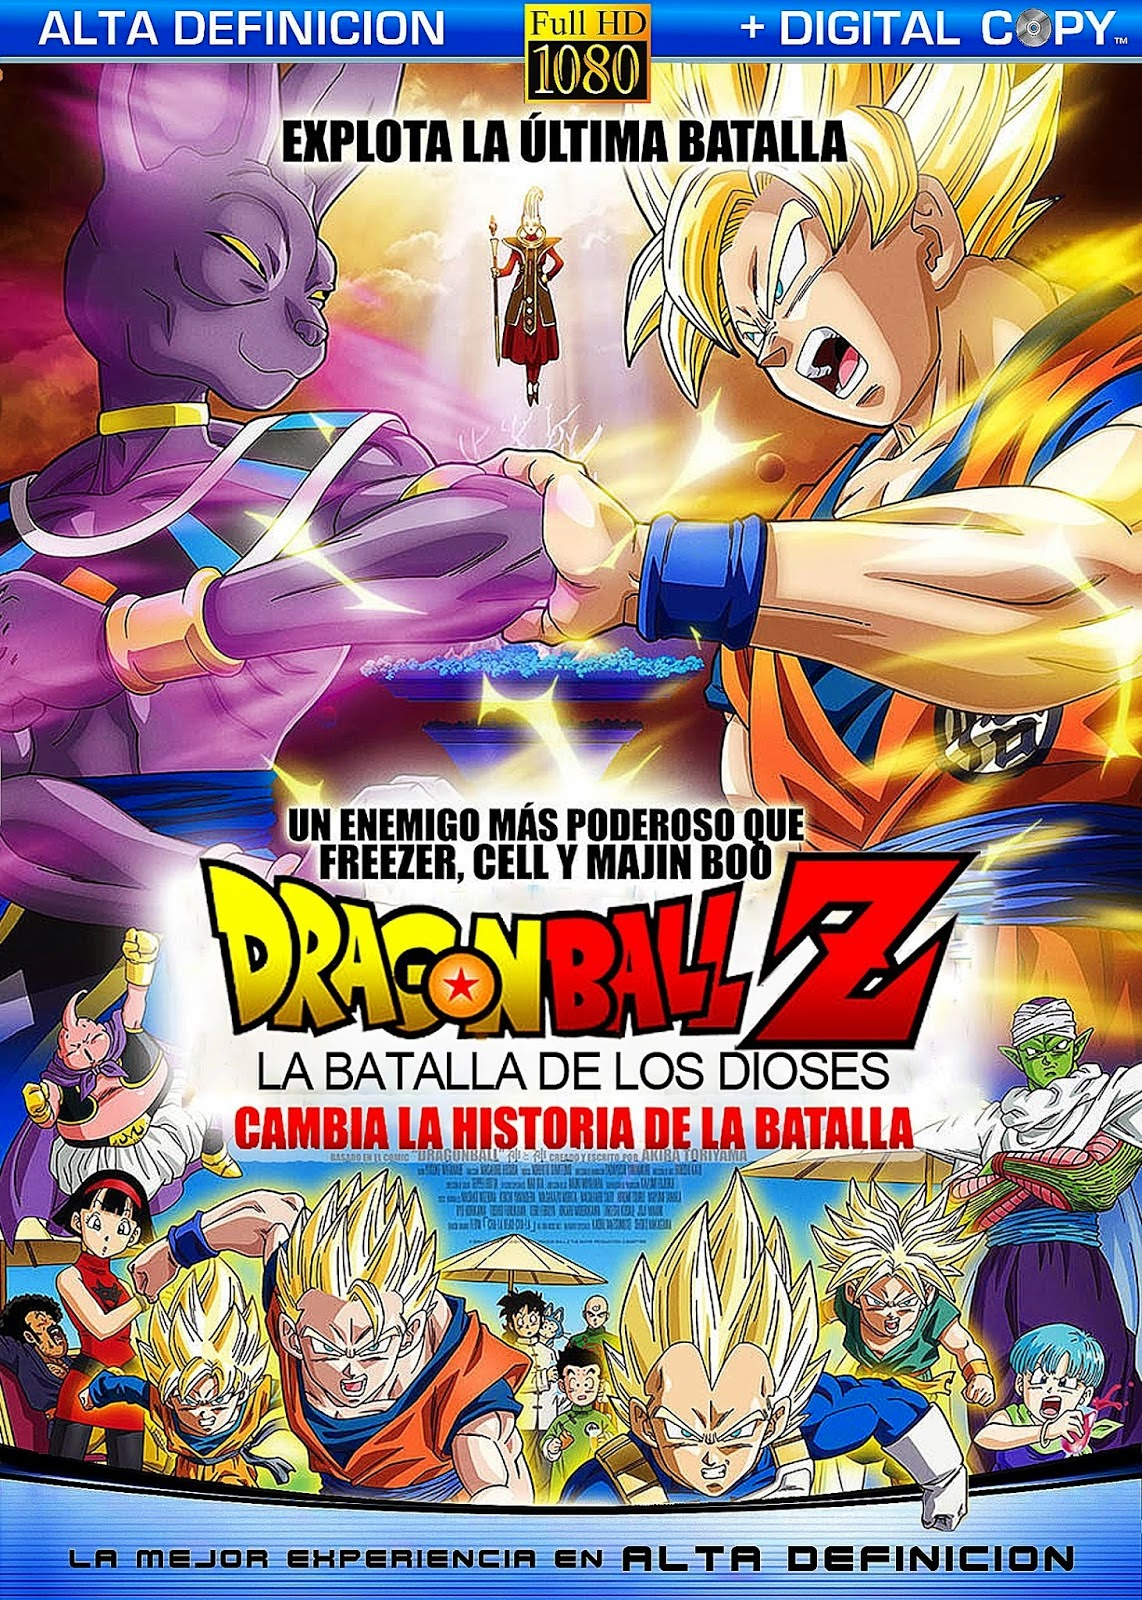 Dragon Ball Z Batalla de los Dioses 1080p Español Latino